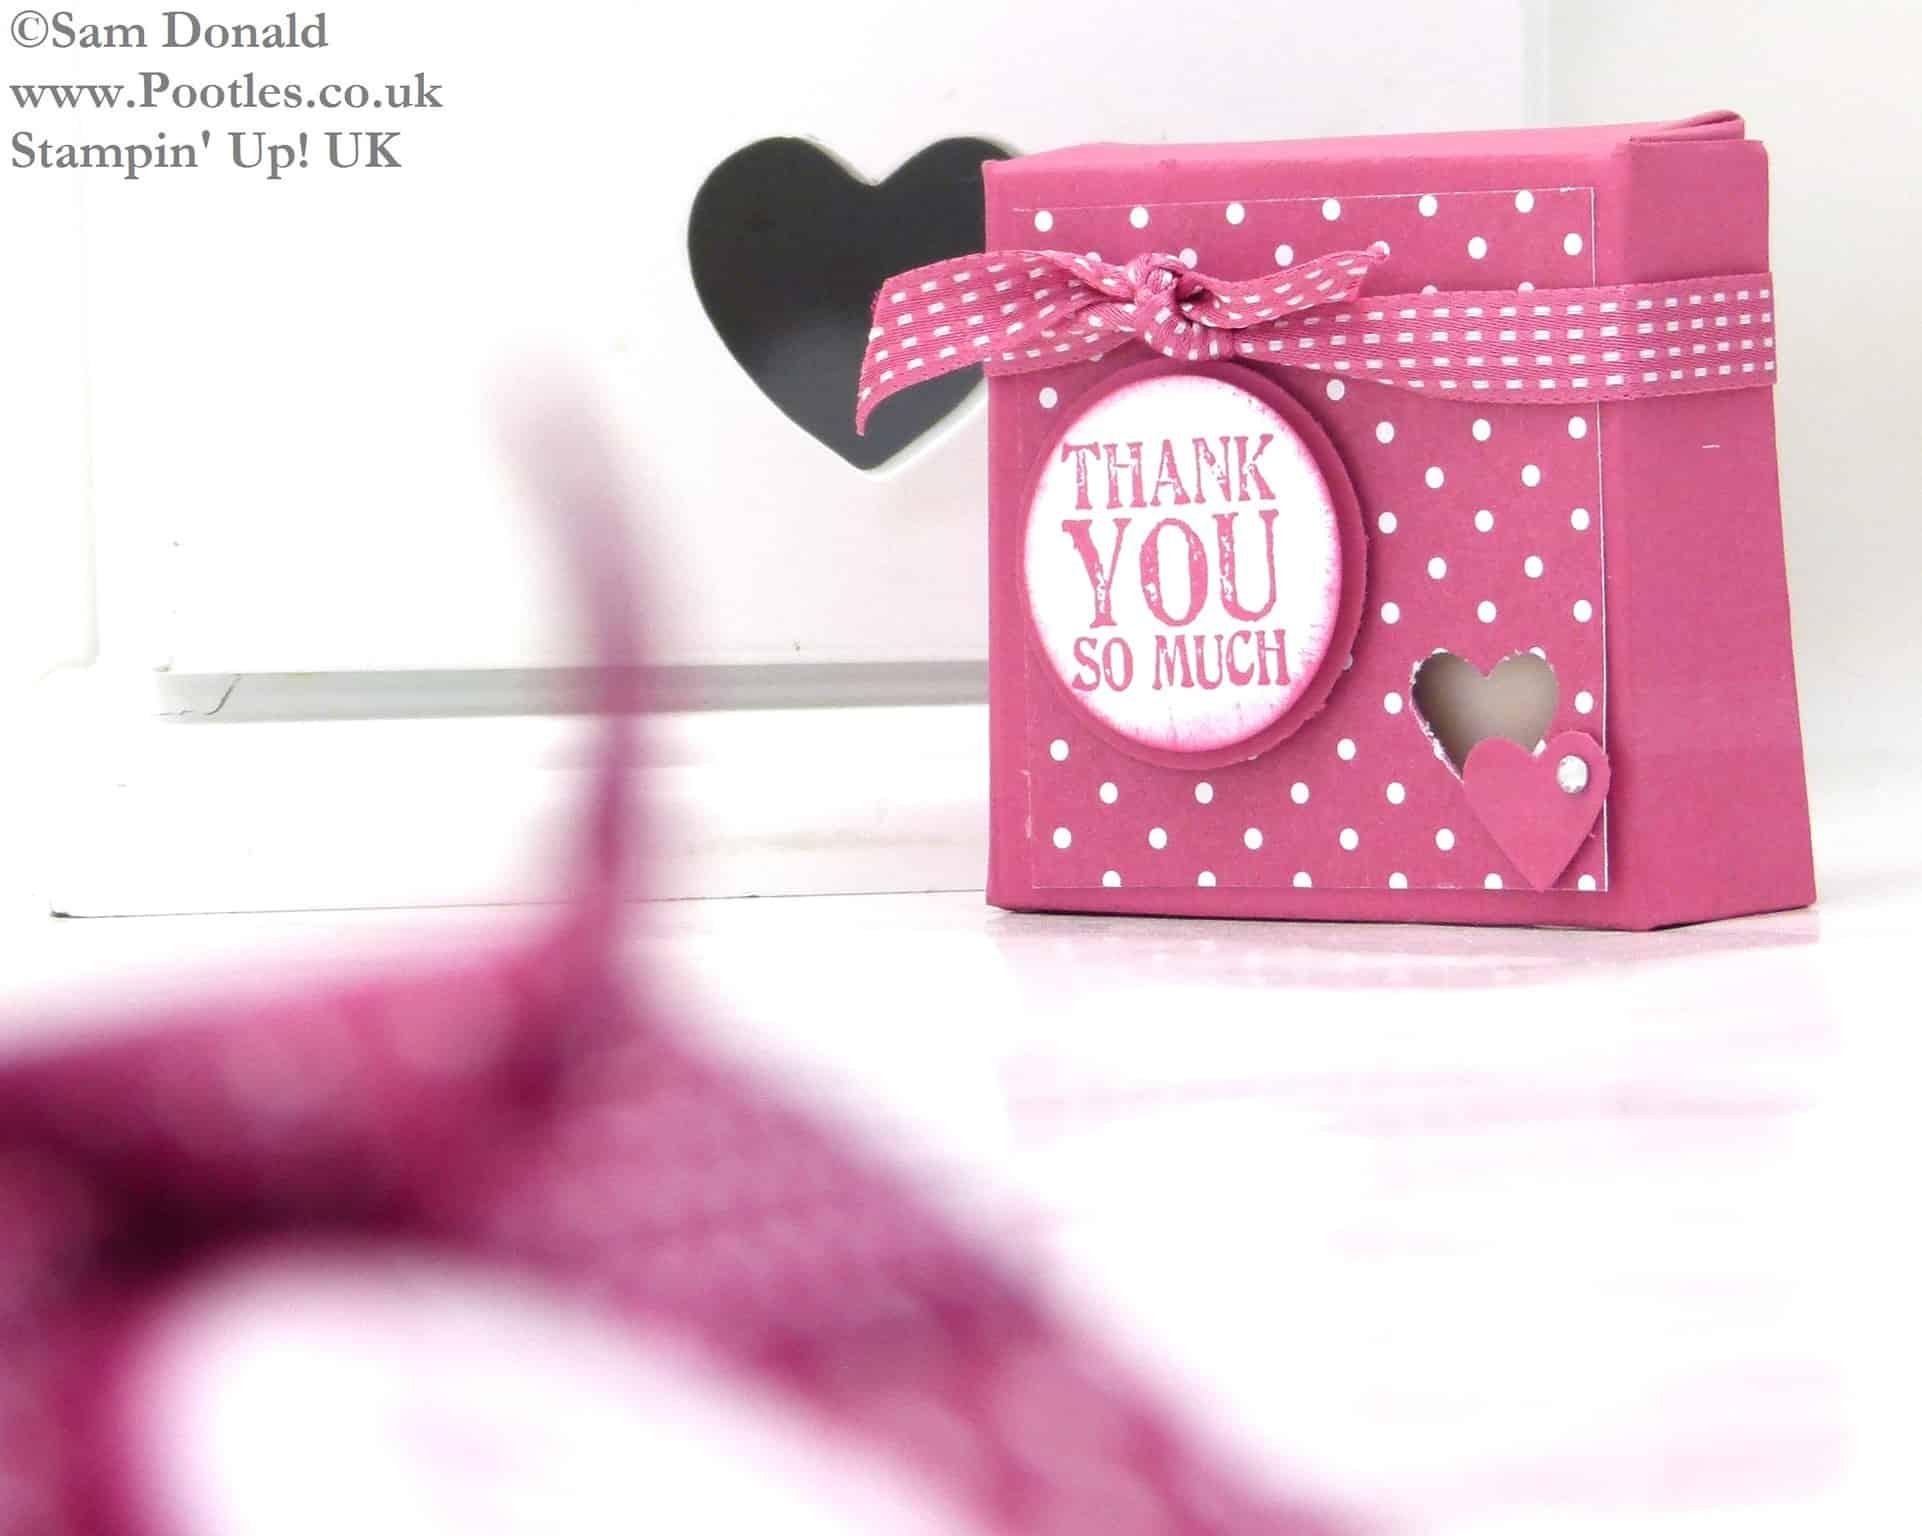 POOTLES Stampin Up UK Fold Flat Wax Melt Favour Box Tutorial 2